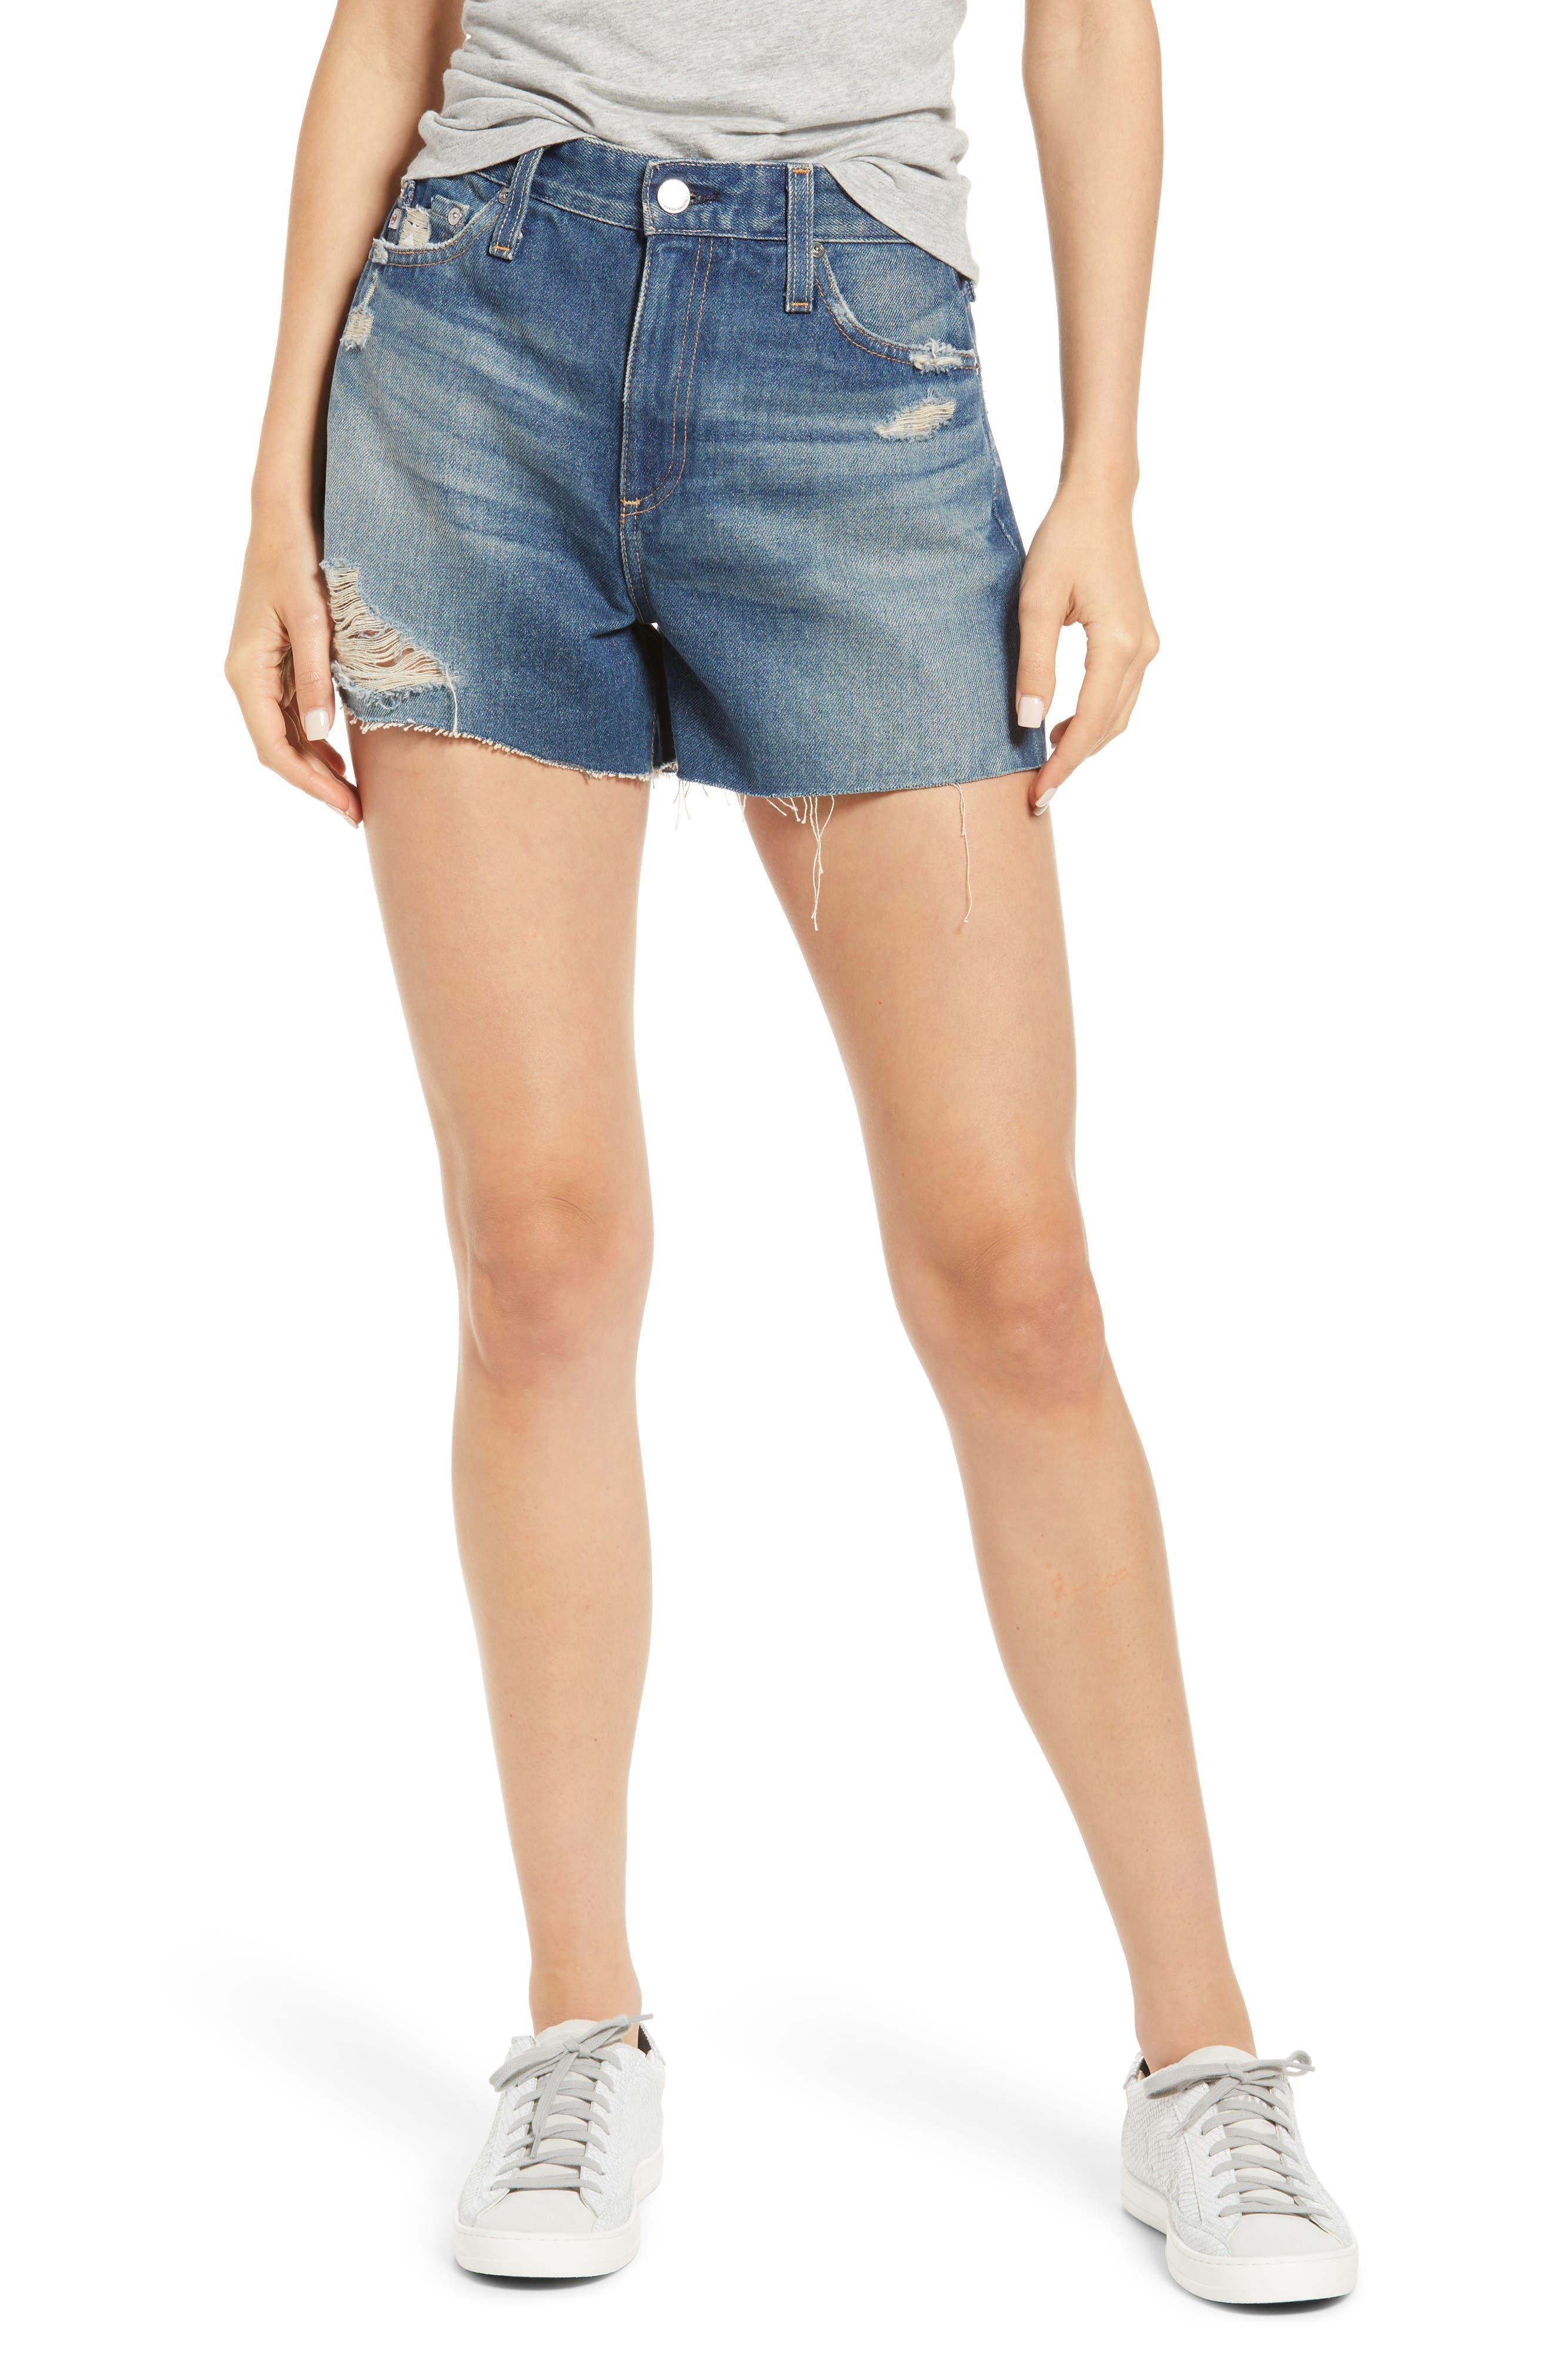 Alexxis High Waist Cutoff Denim Shorts